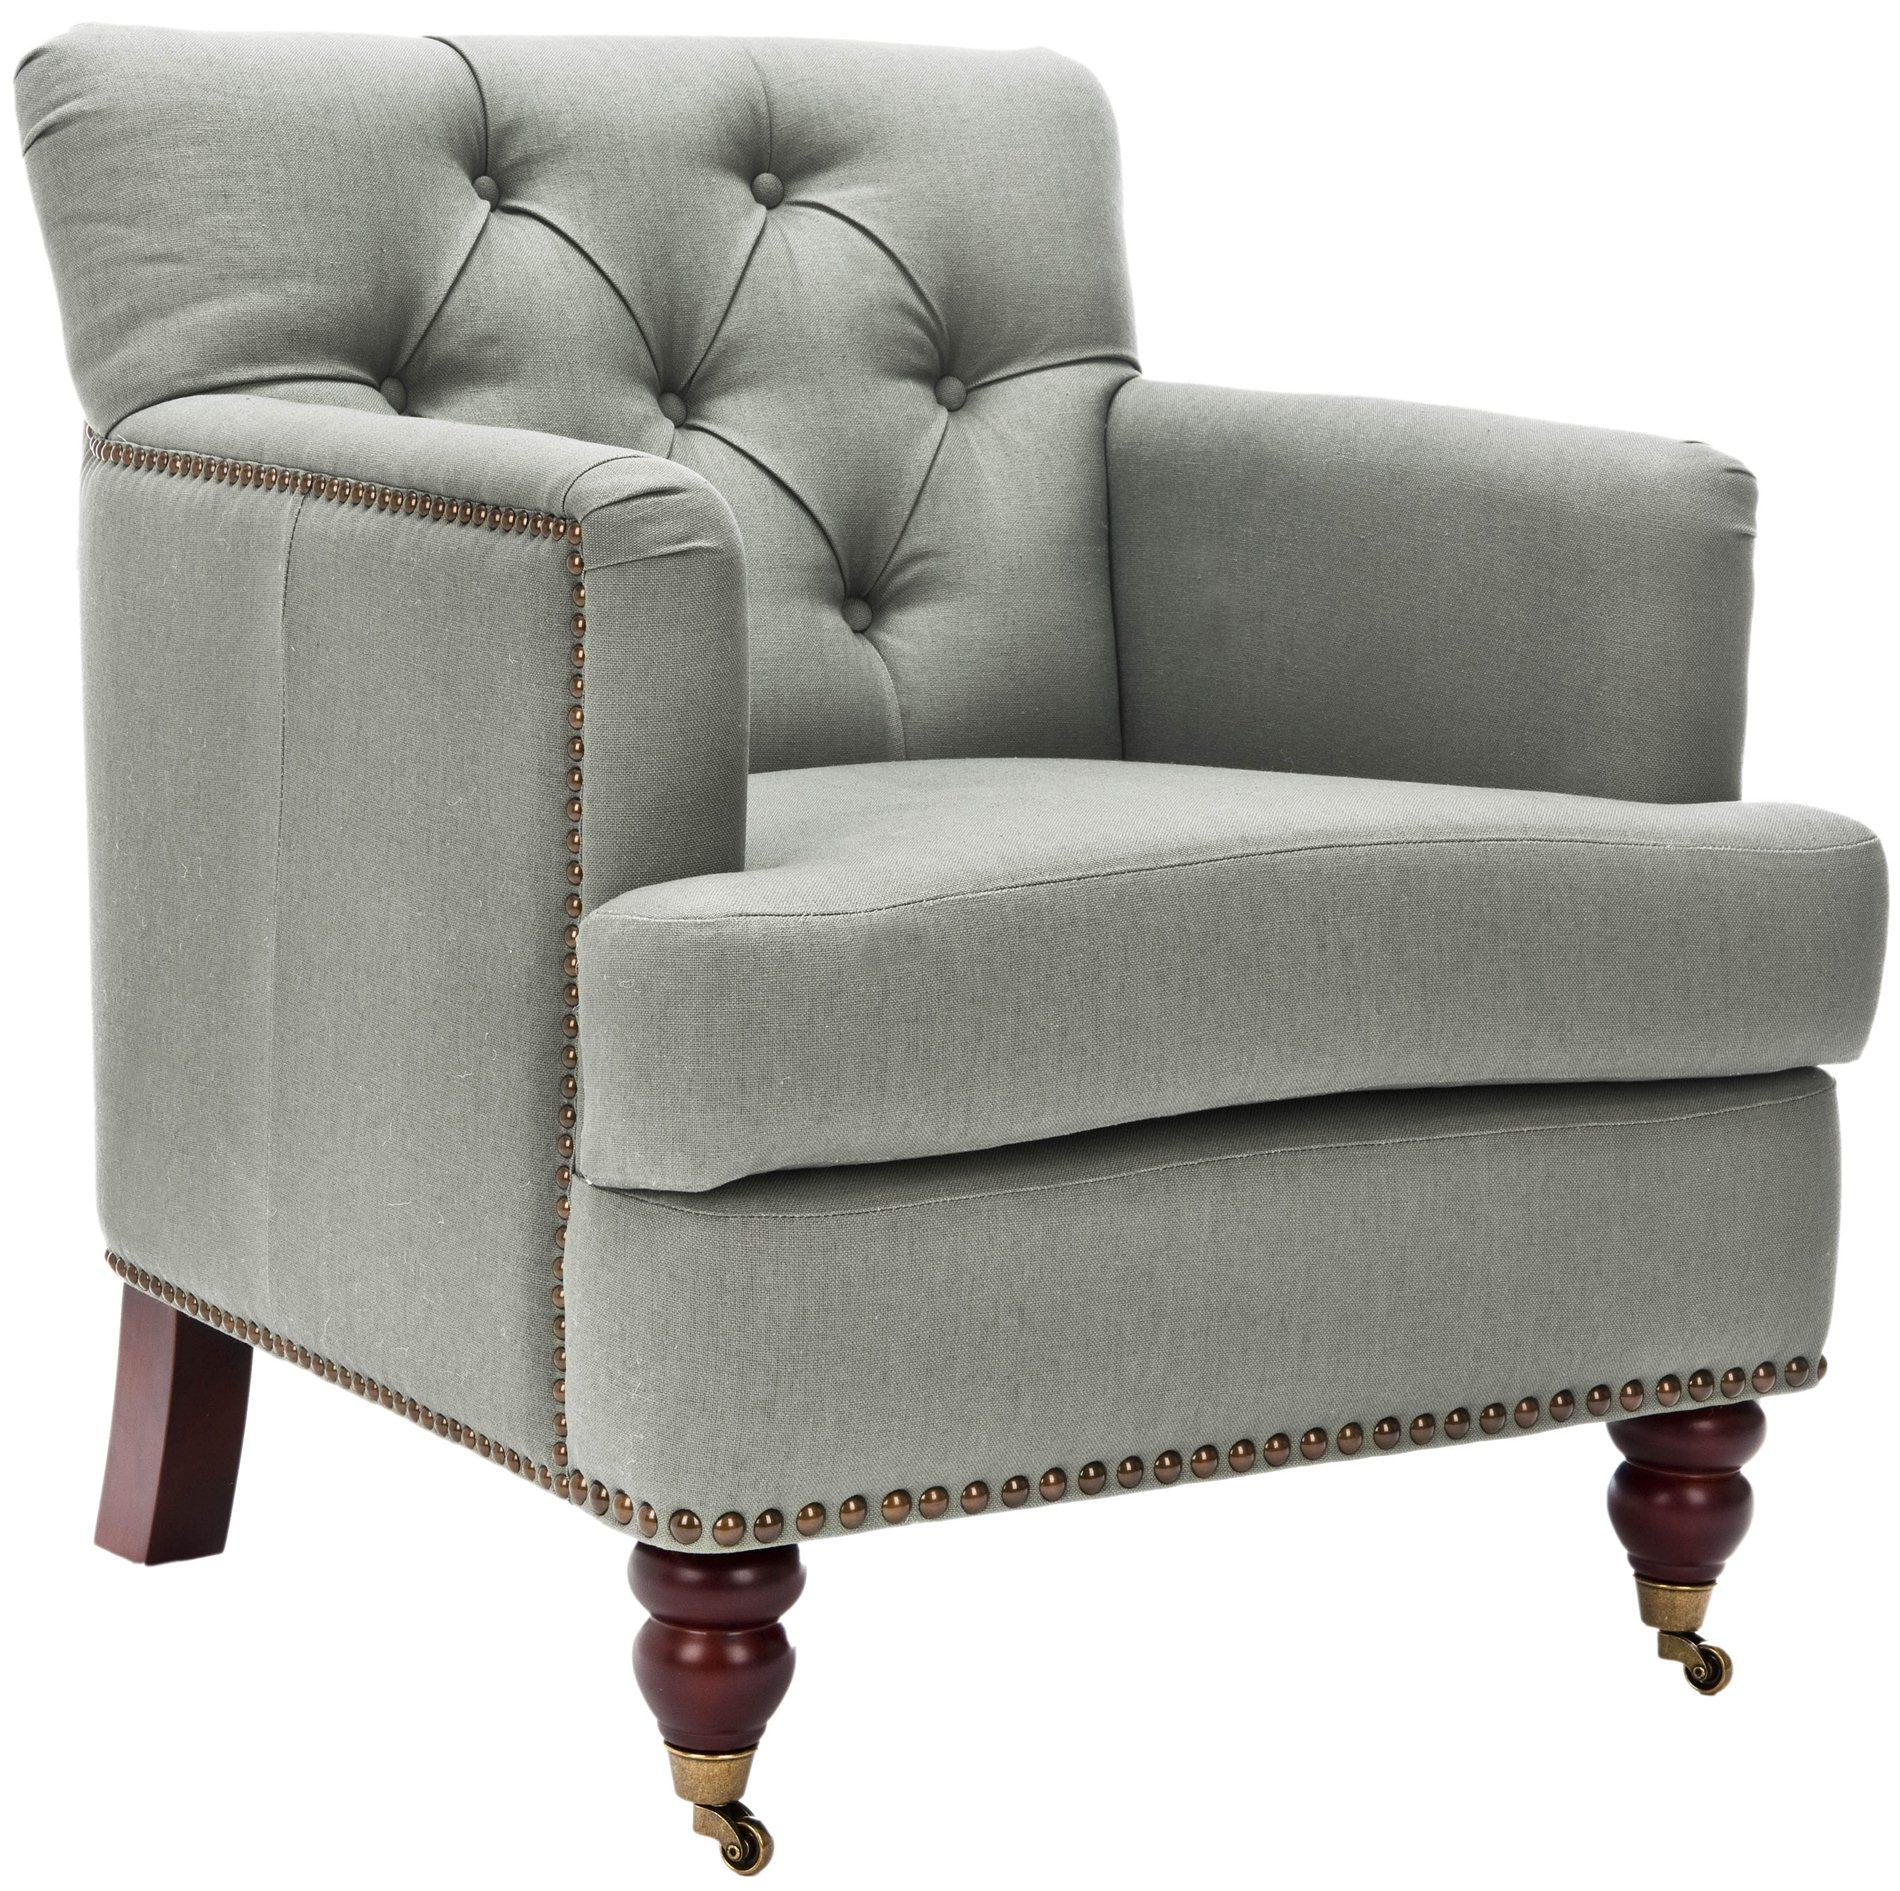 safavieh colin tufted club chair steel flipkart hud8212d sfv